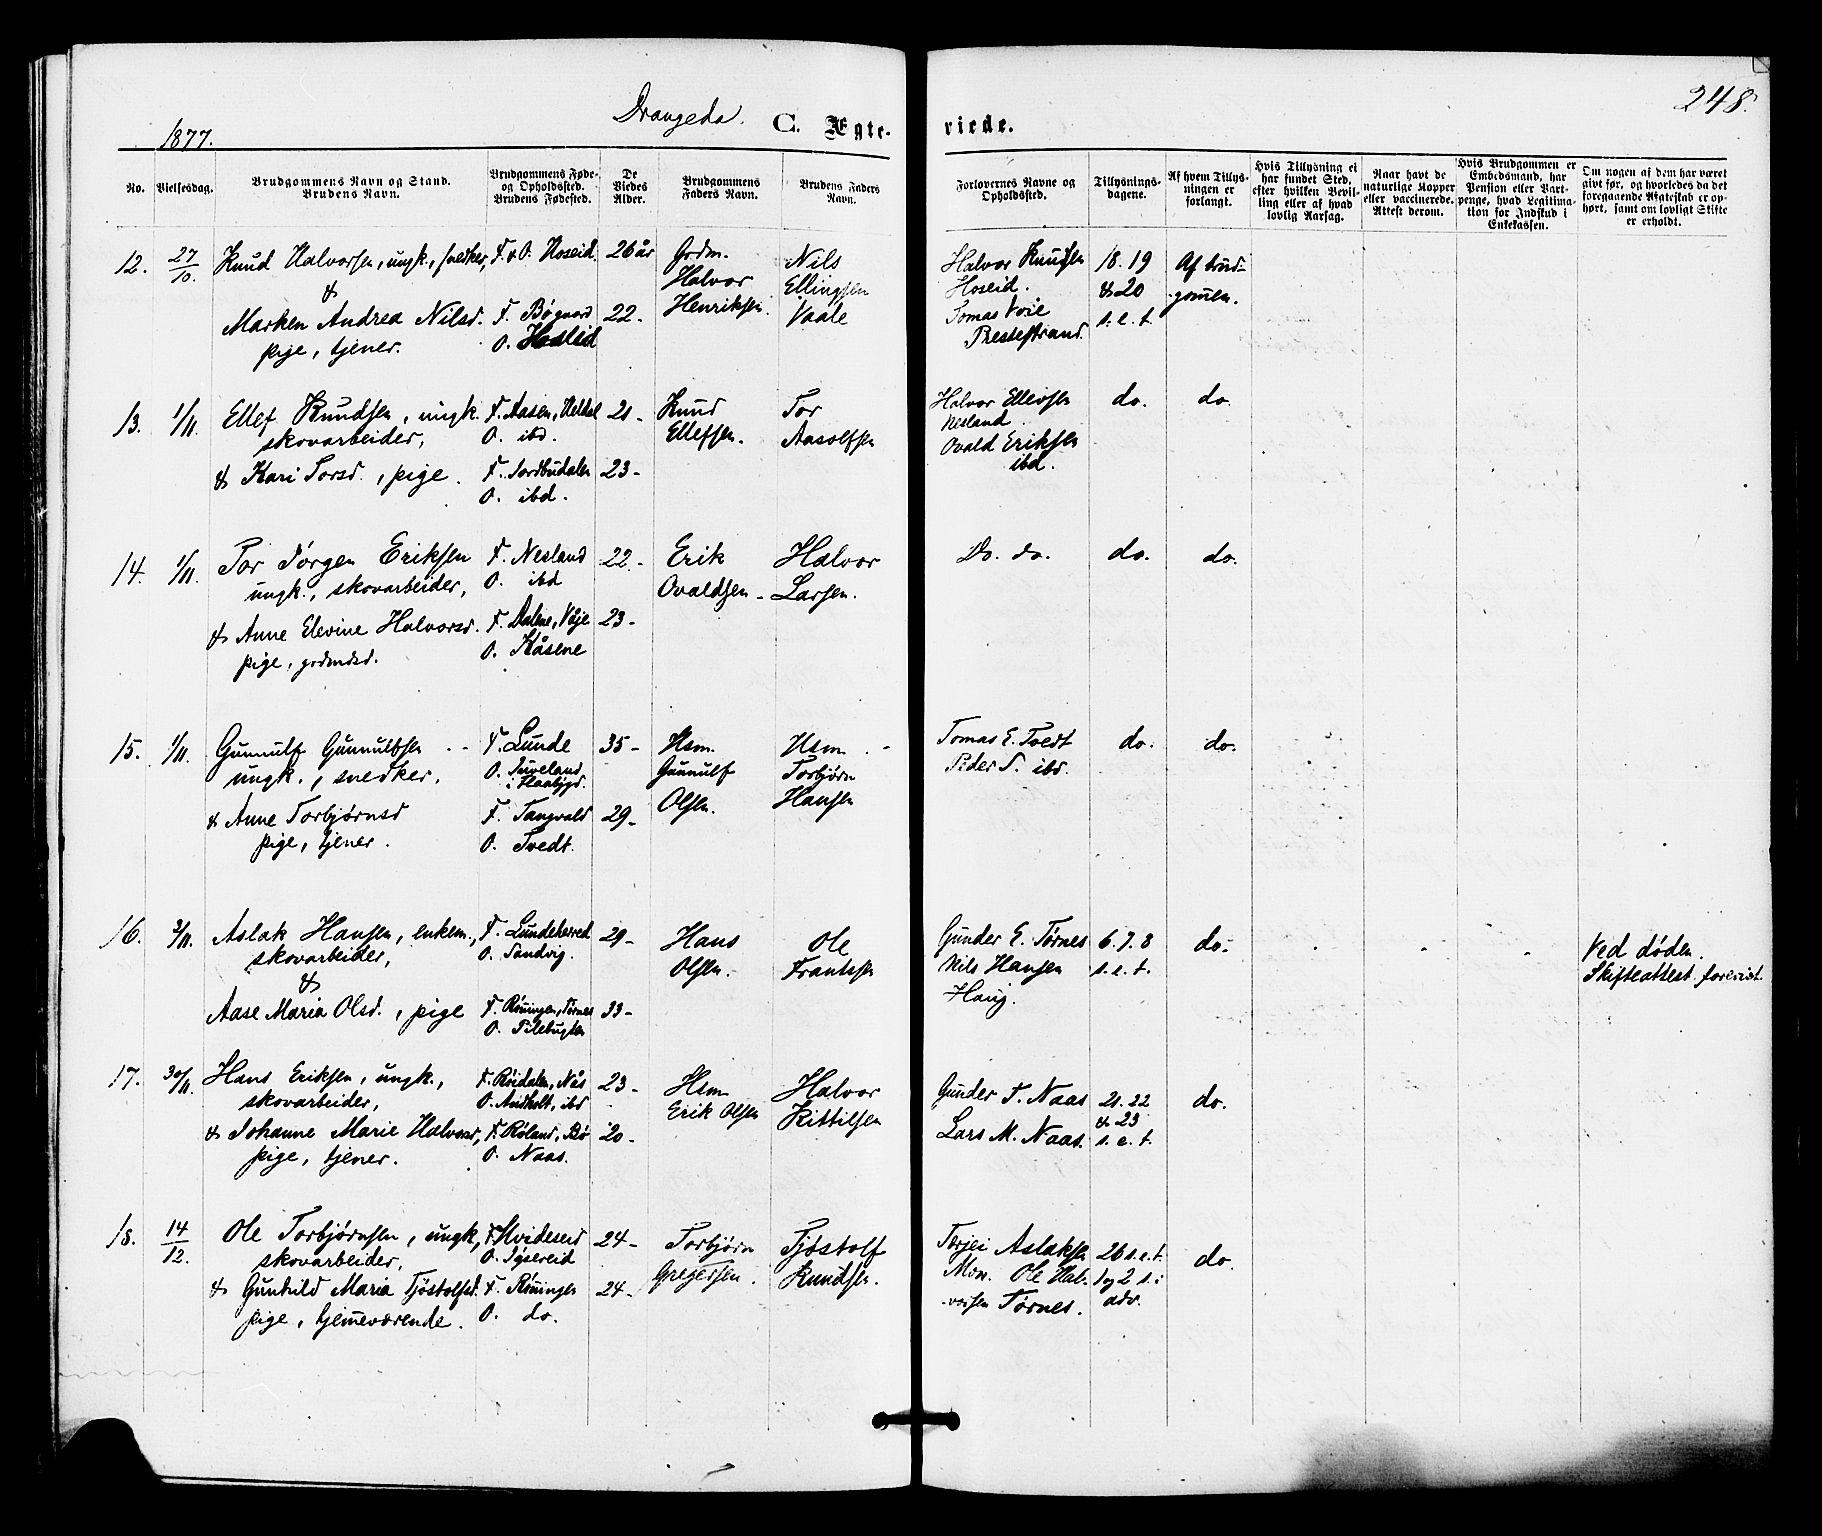 SAKO, Drangedal kirkebøker, F/Fa/L0009: Ministerialbok nr. 9 /1, 1872-1884, s. 248